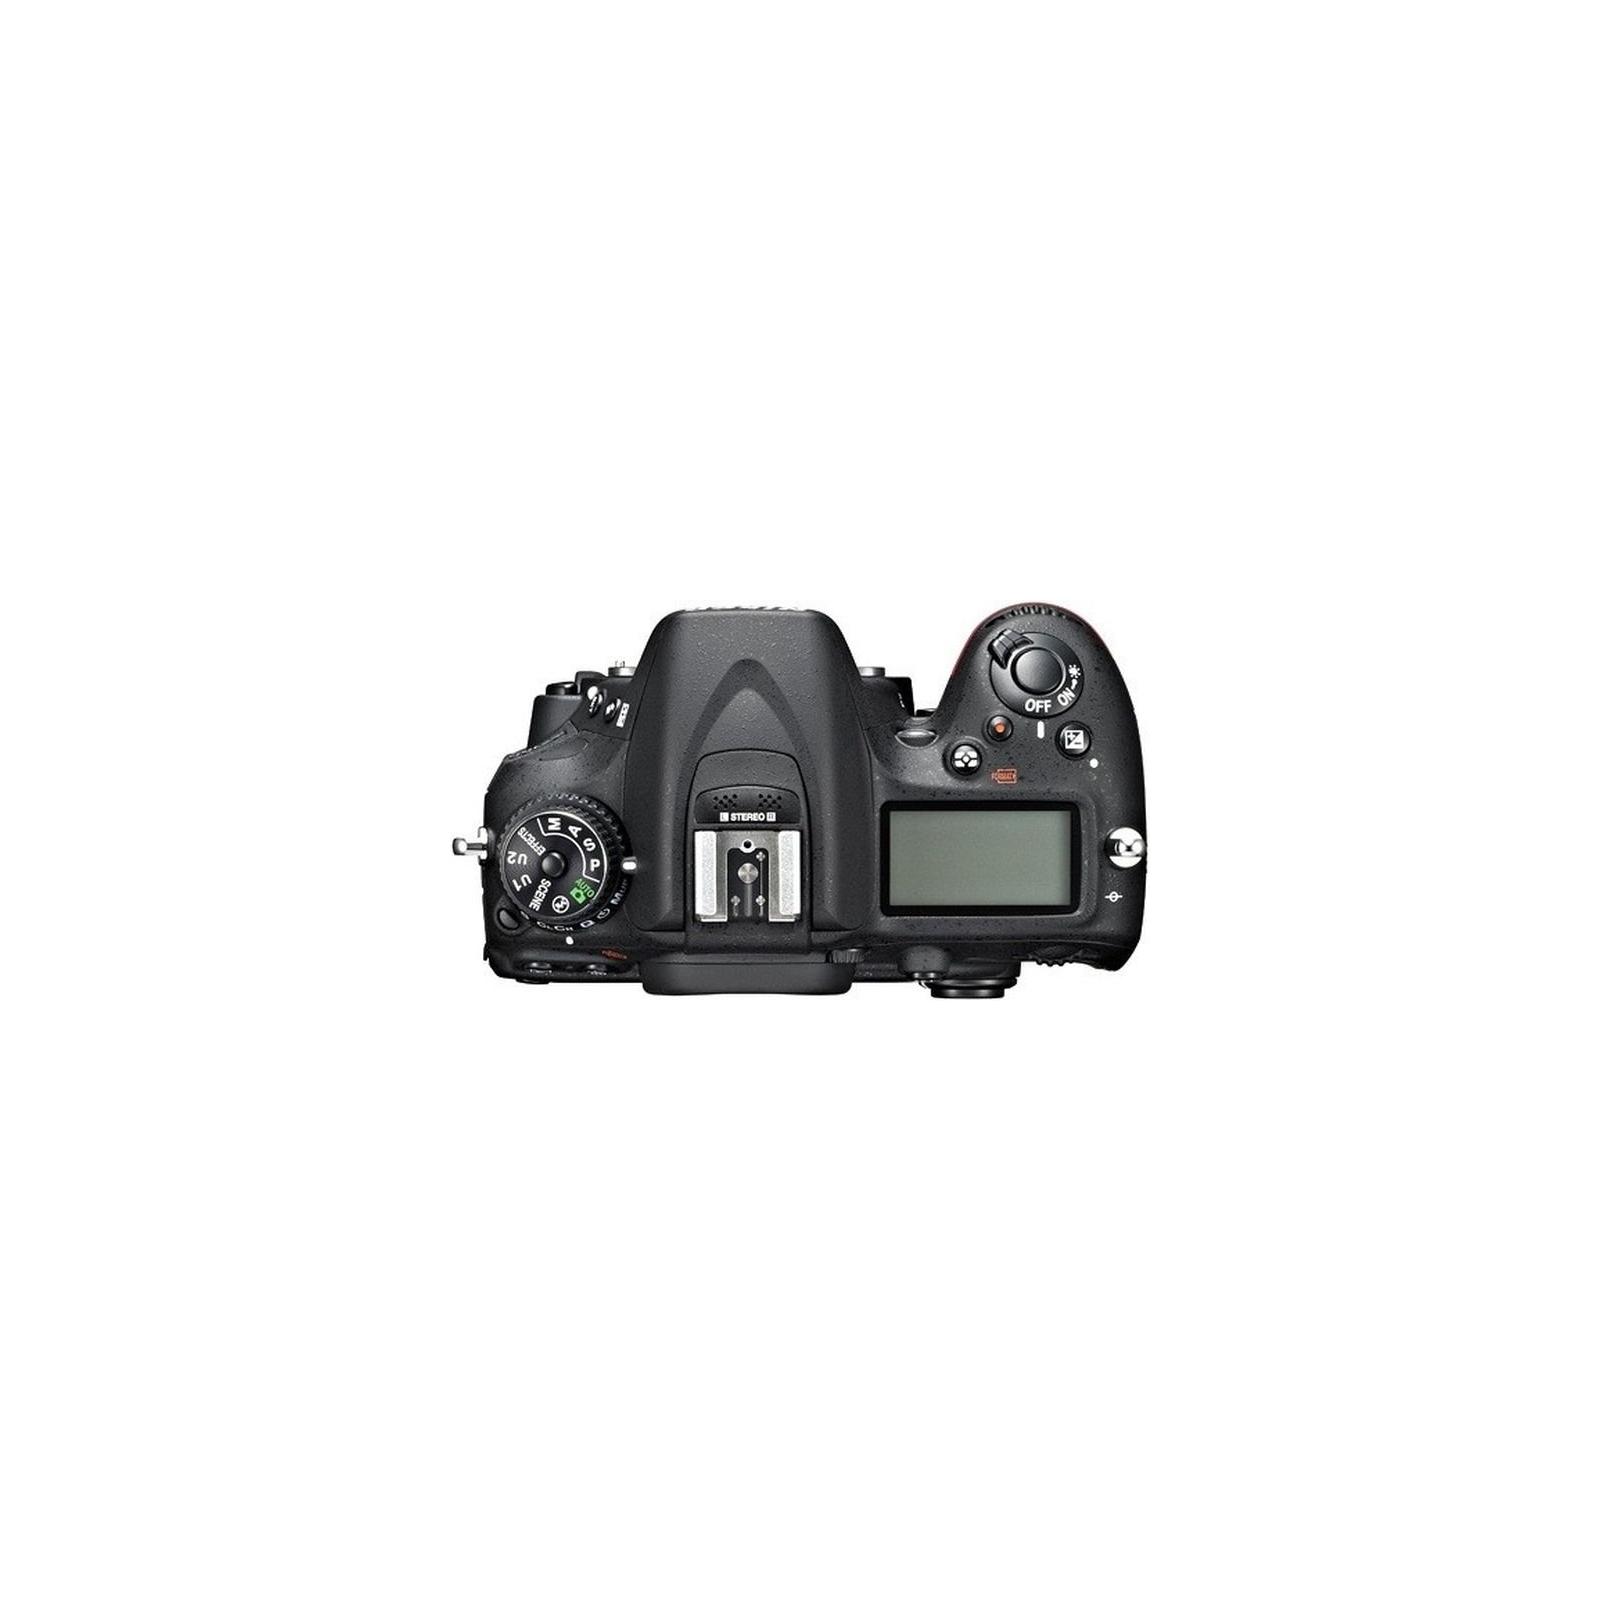 Цифровой фотоаппарат Nikon D610 body (VBA430AE) изображение 3